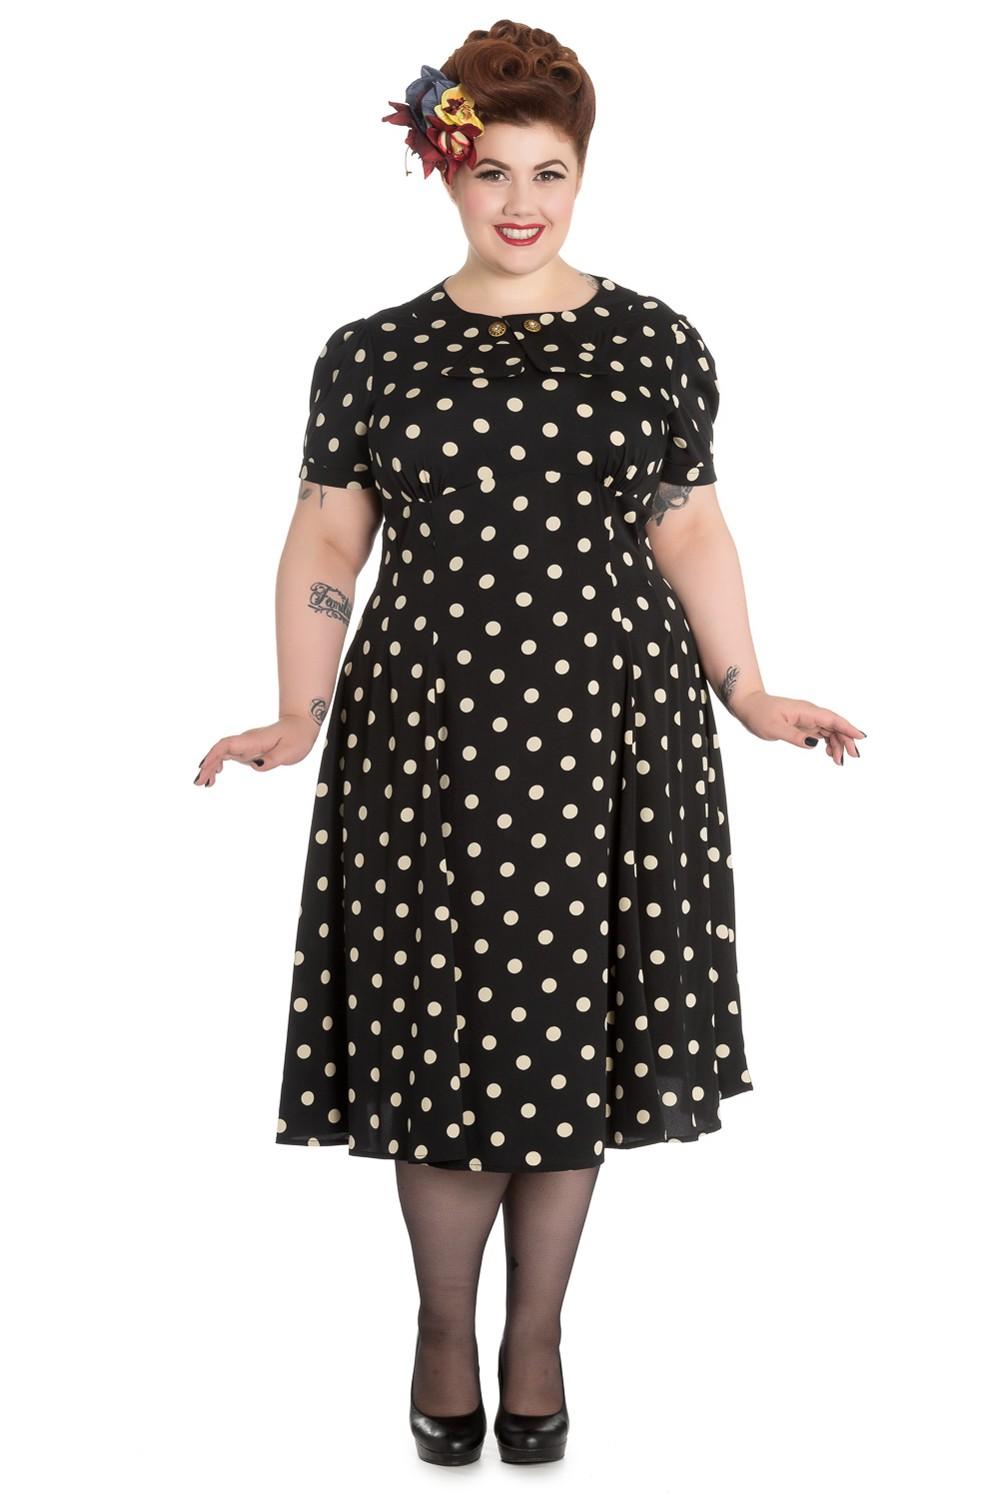 01f02883be8180 Madden 40er Jahre retro Polka Dots Kleid v. Hell Bunny Frauen Kleider